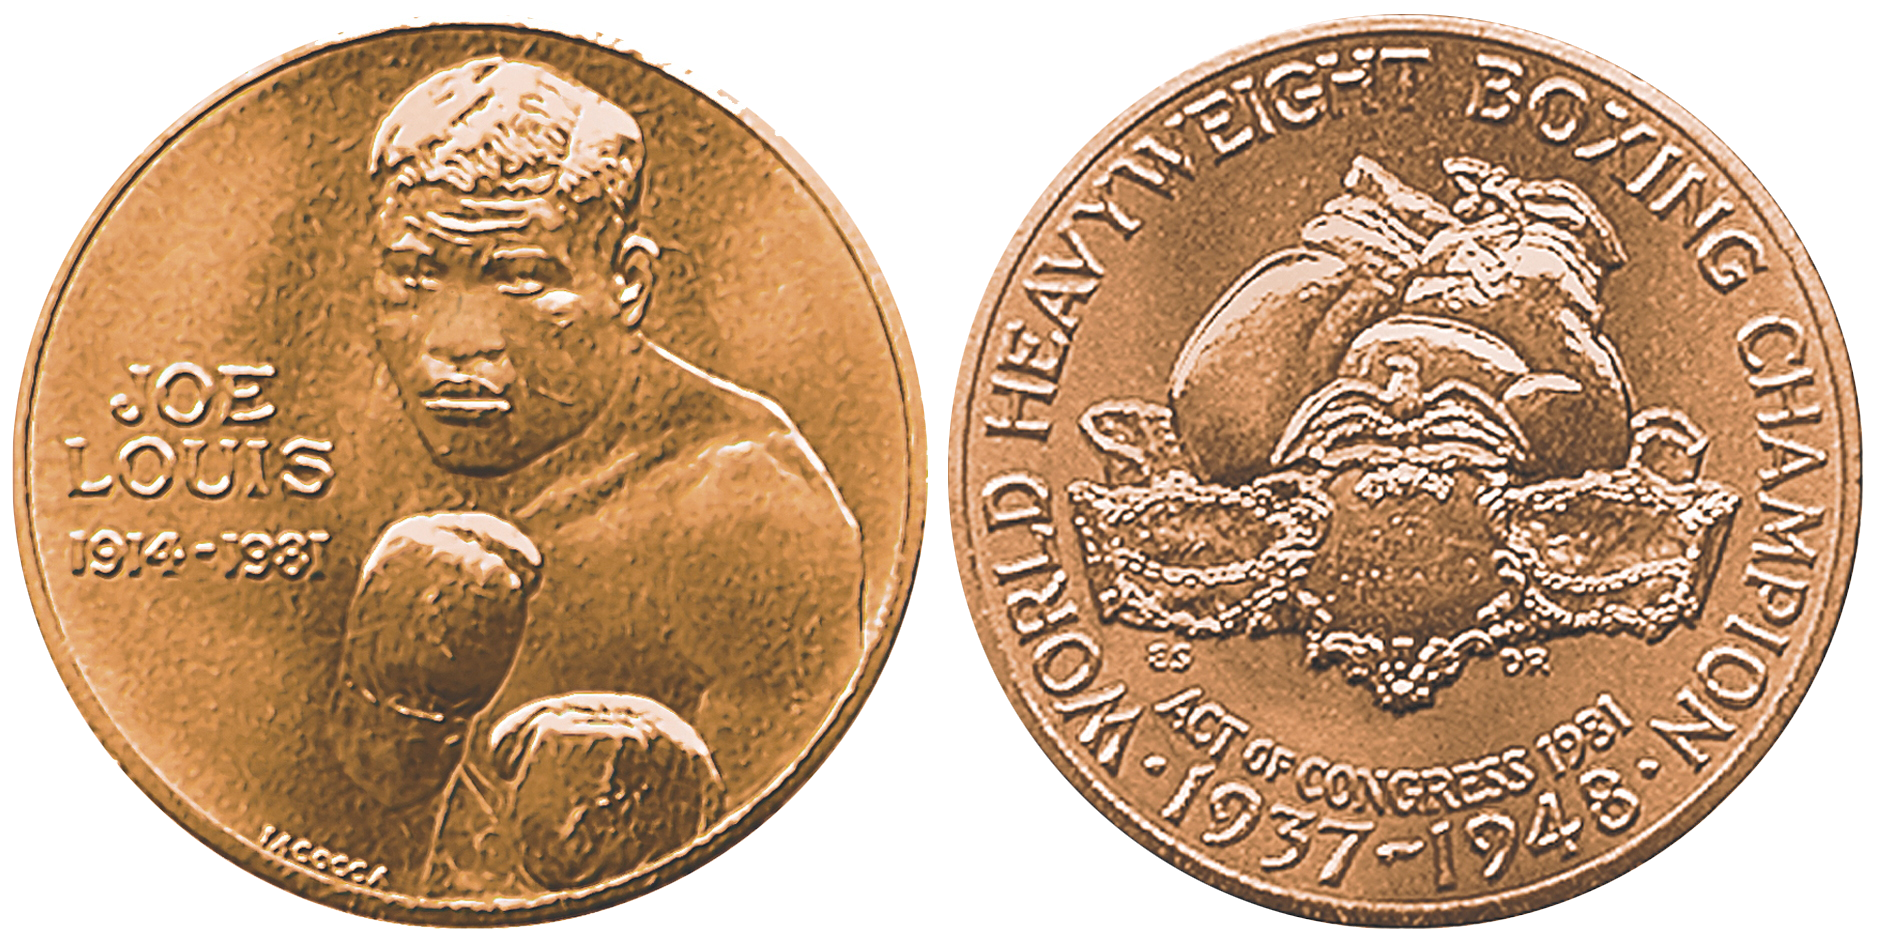 Joe Louis Bourbon - Joe Louis's Congressional Gold Medal, 1982